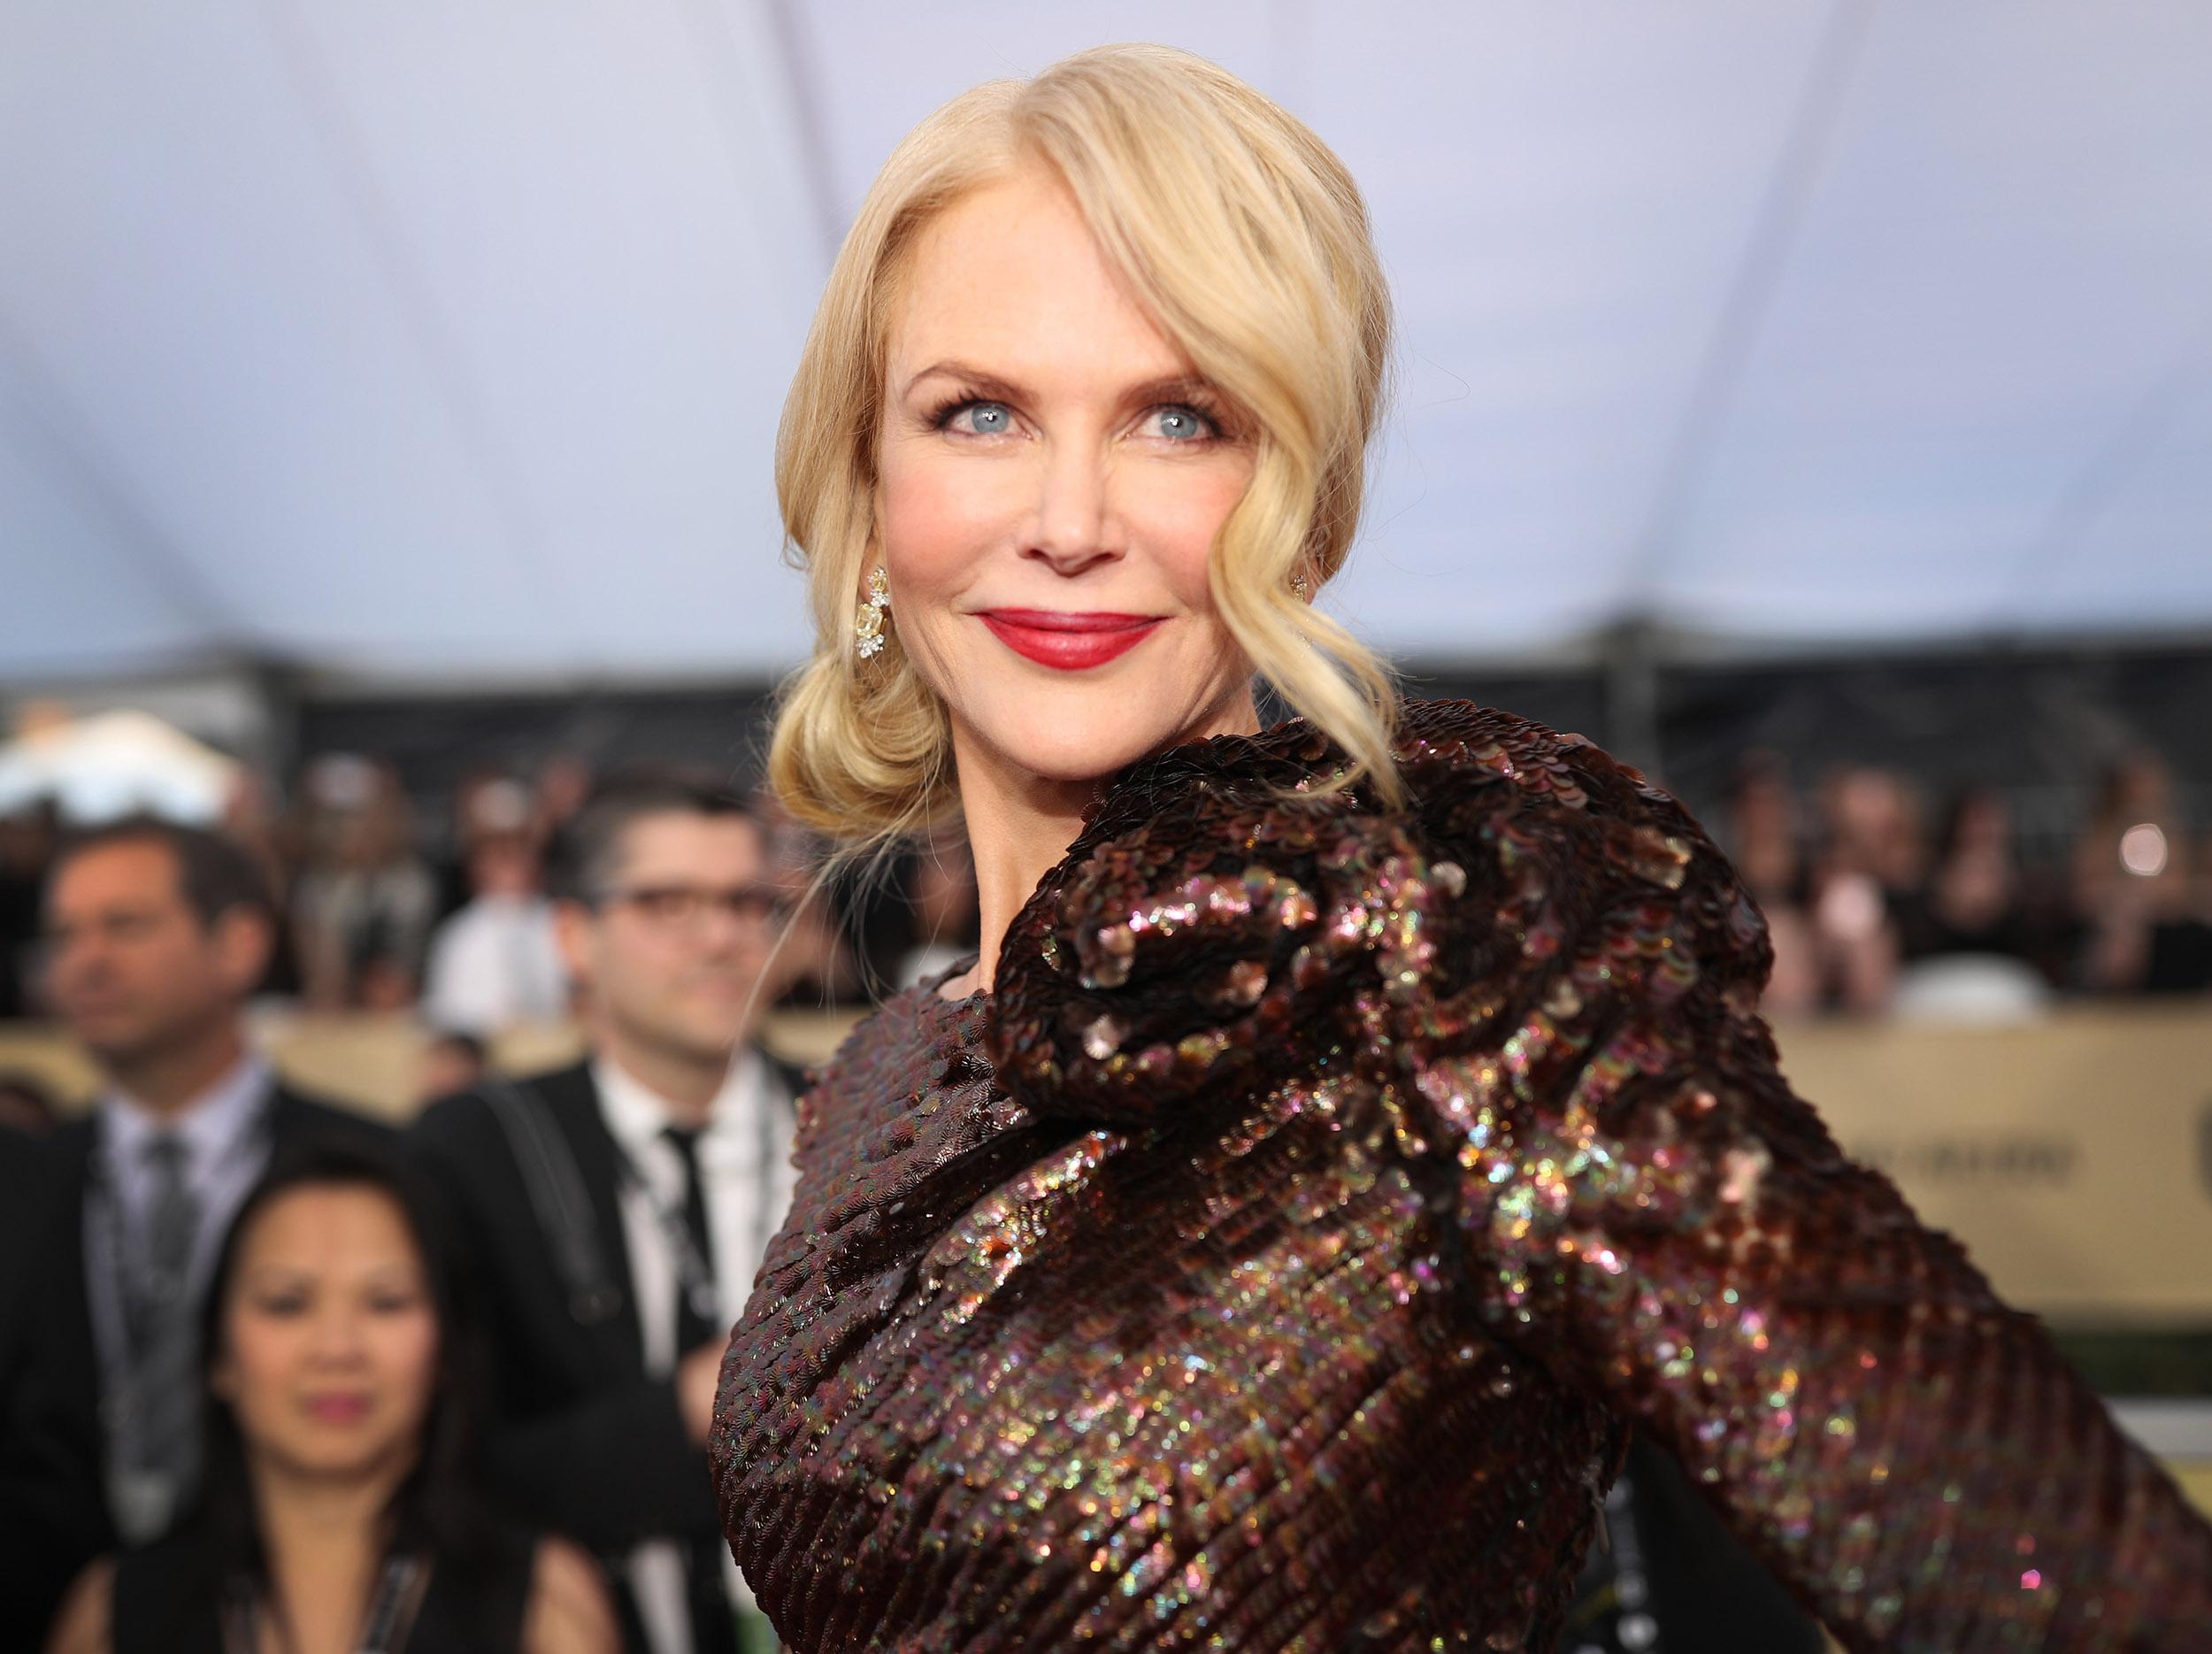 Nicole Kidman gets quarantine exemption by Hong Kong to film TV series